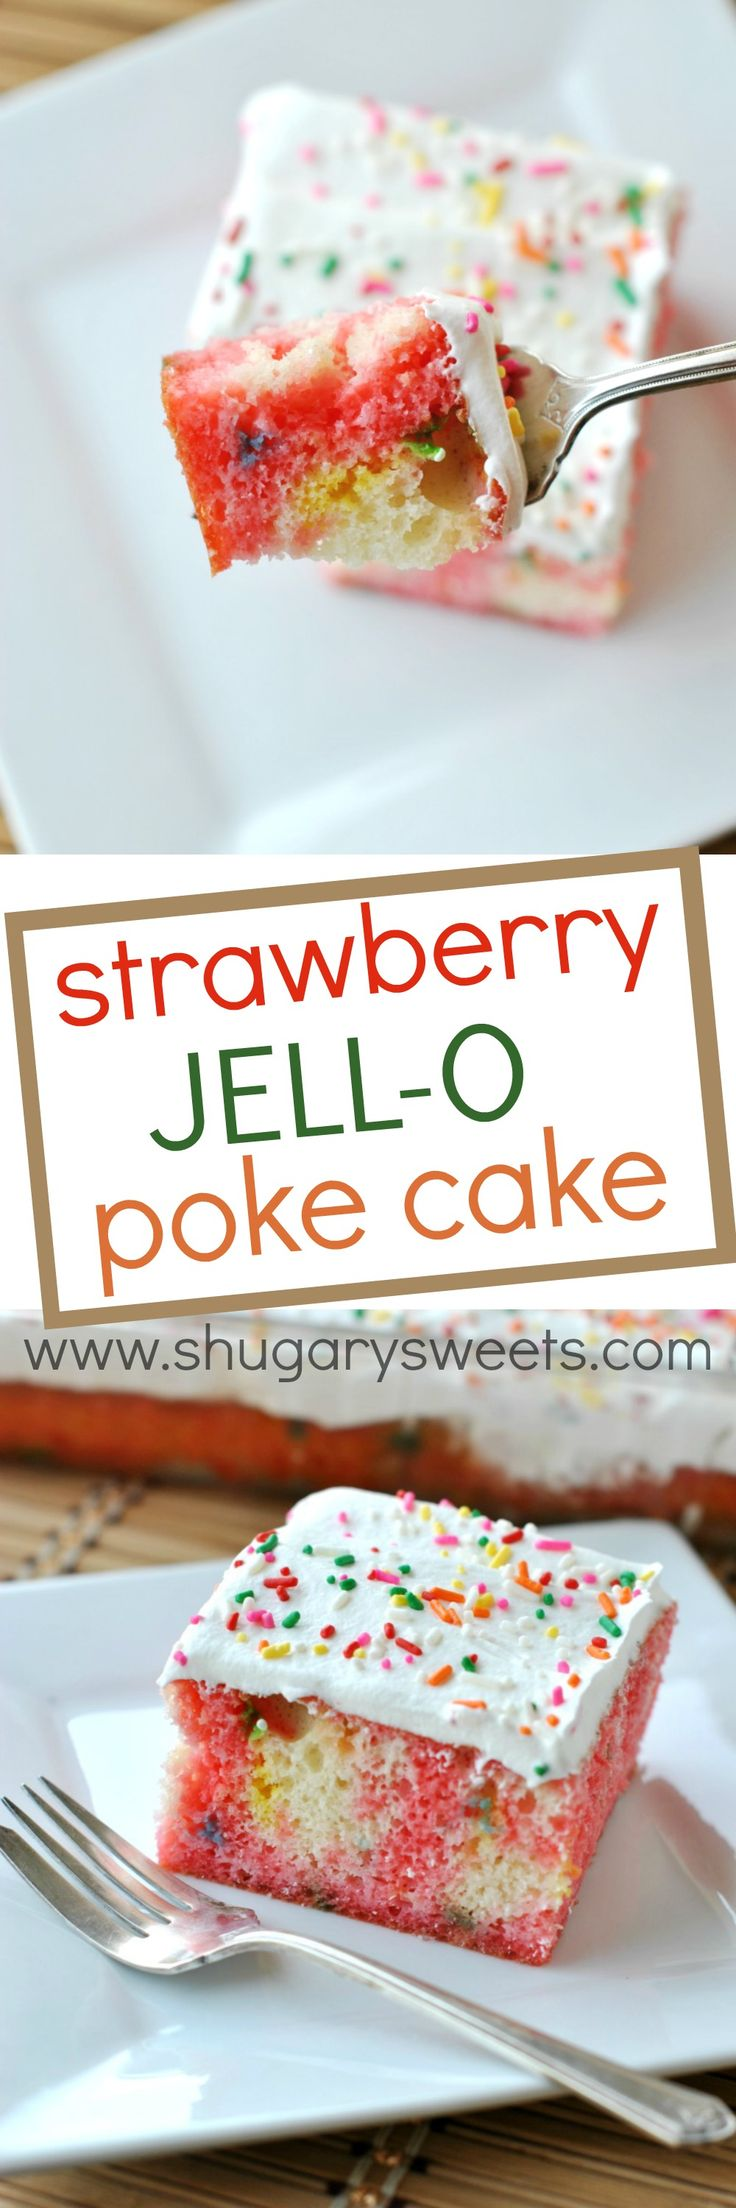 Classic Strawberry JELL-O Poke Cake with a Funfetti twist! Light and refreshing summer dessert